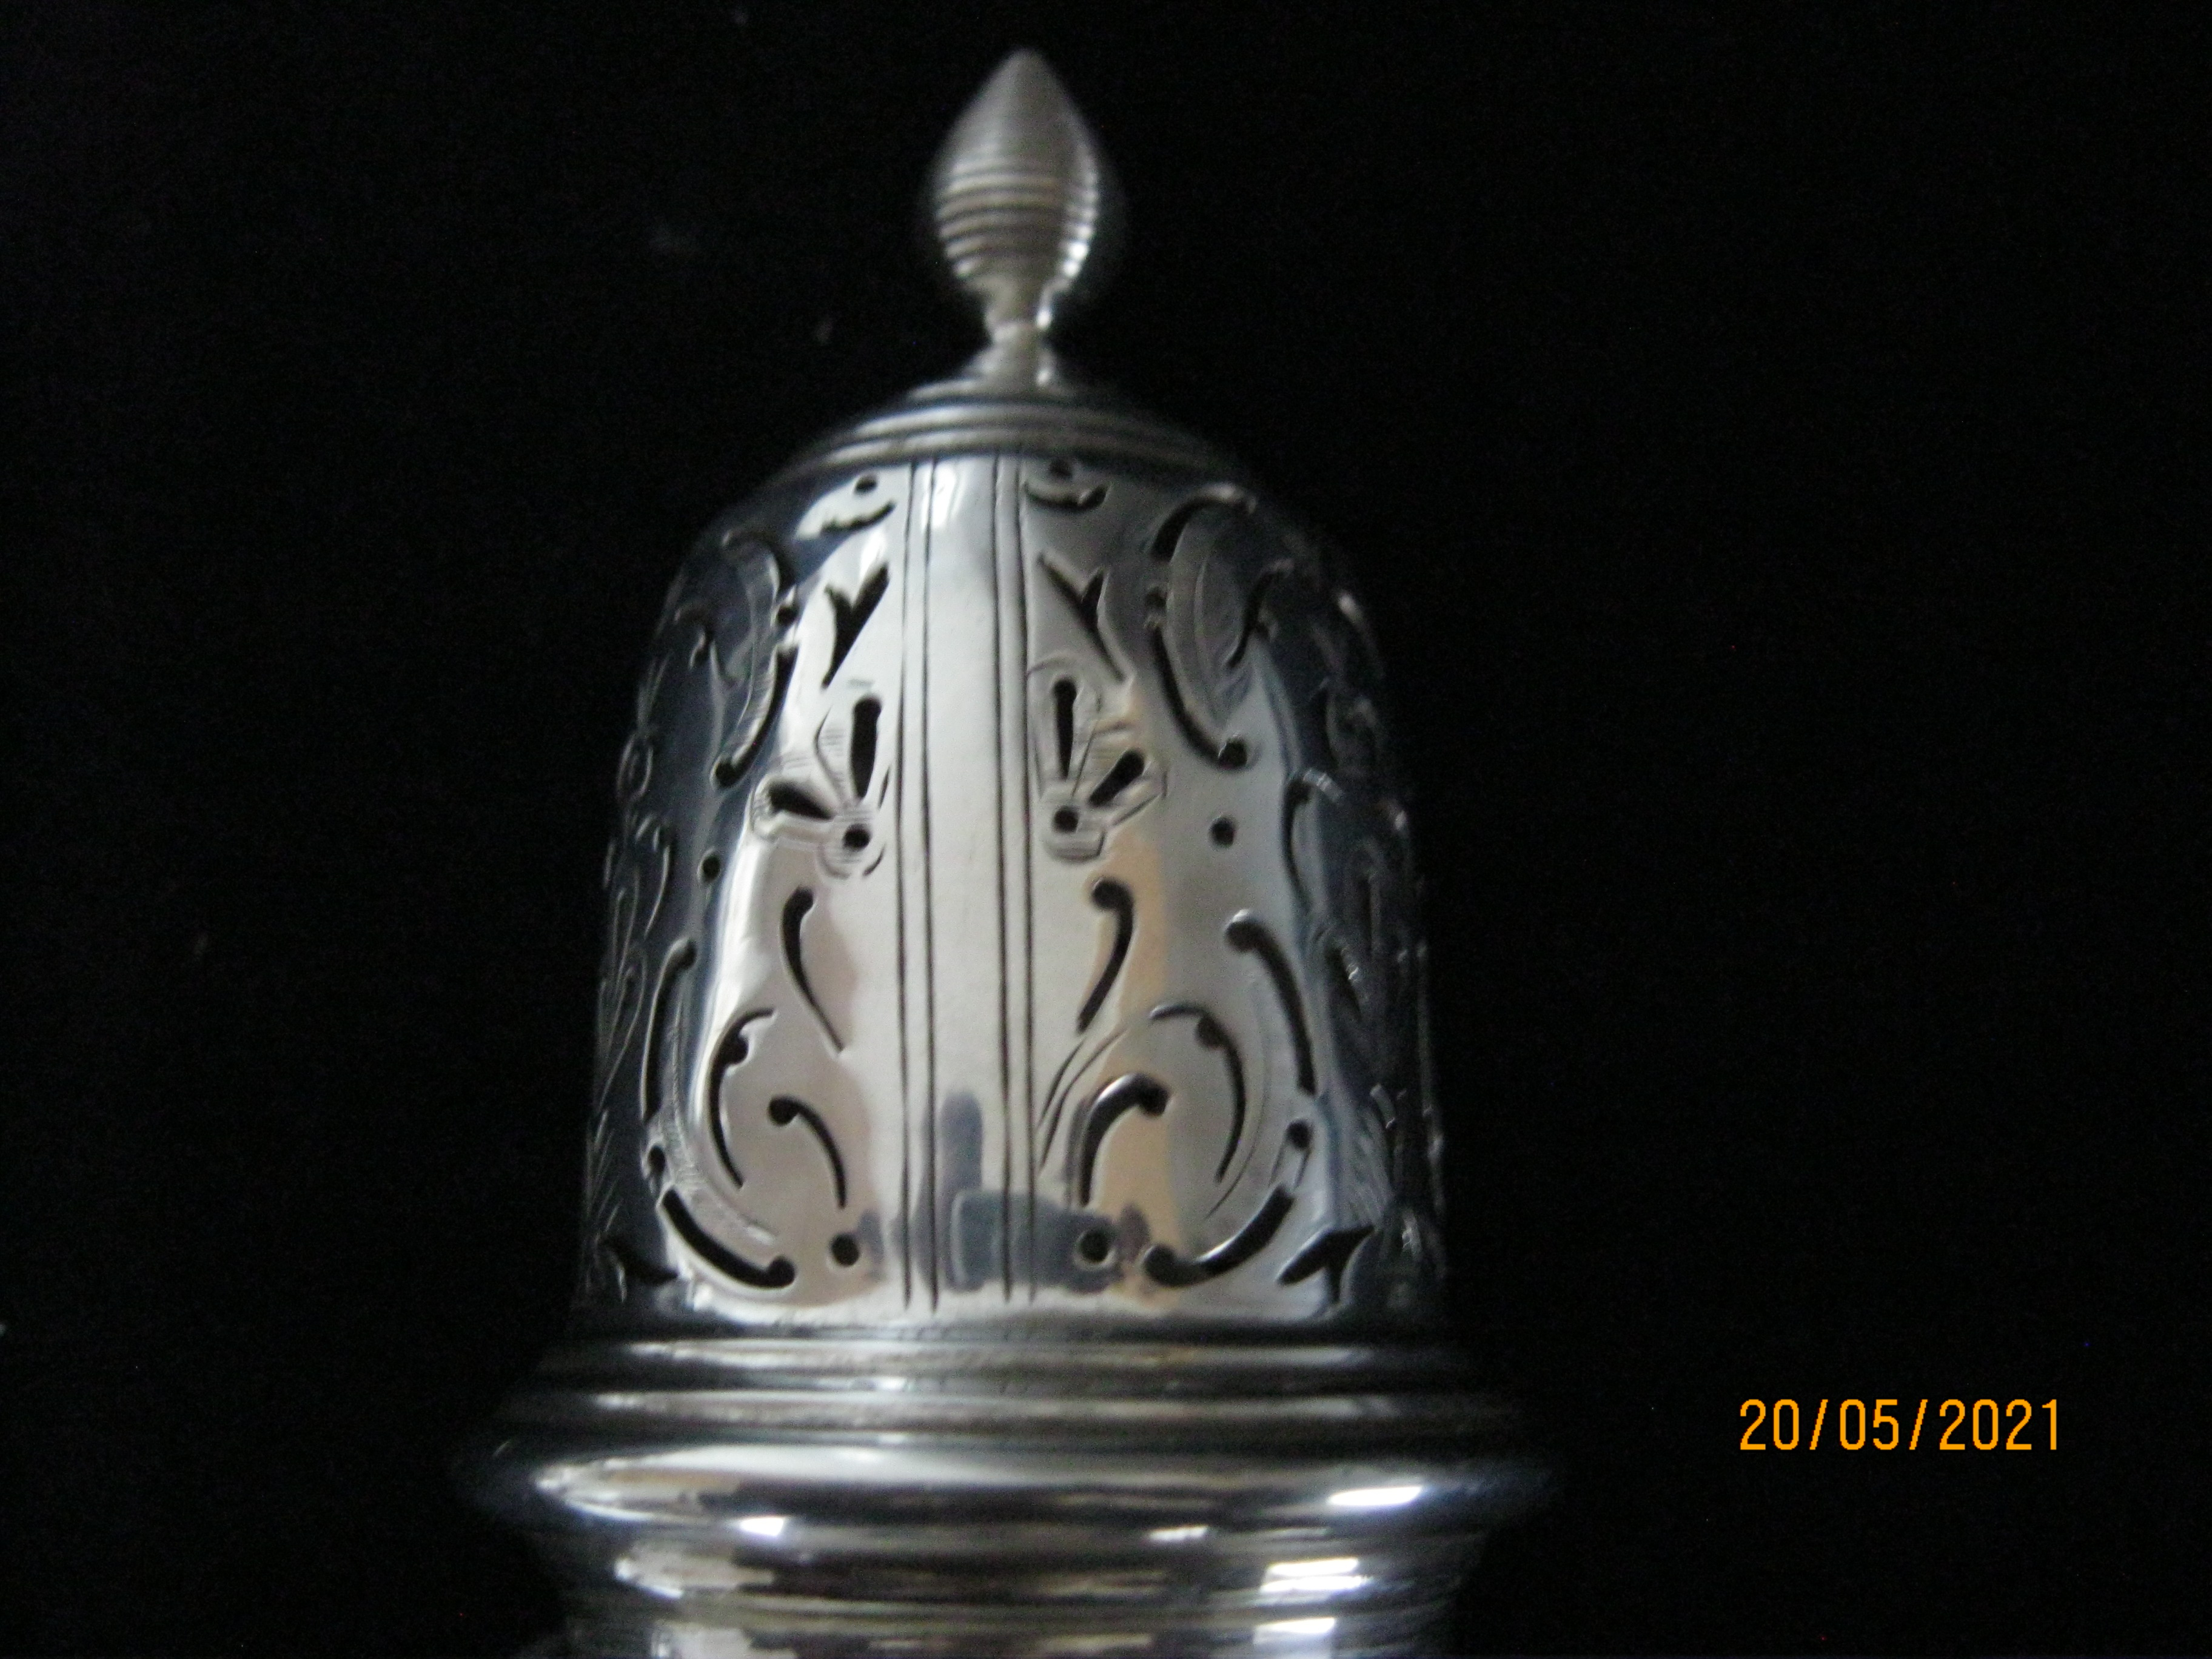 Antique Sterling Silver Sugar Caster 1924 - Image 4 of 7